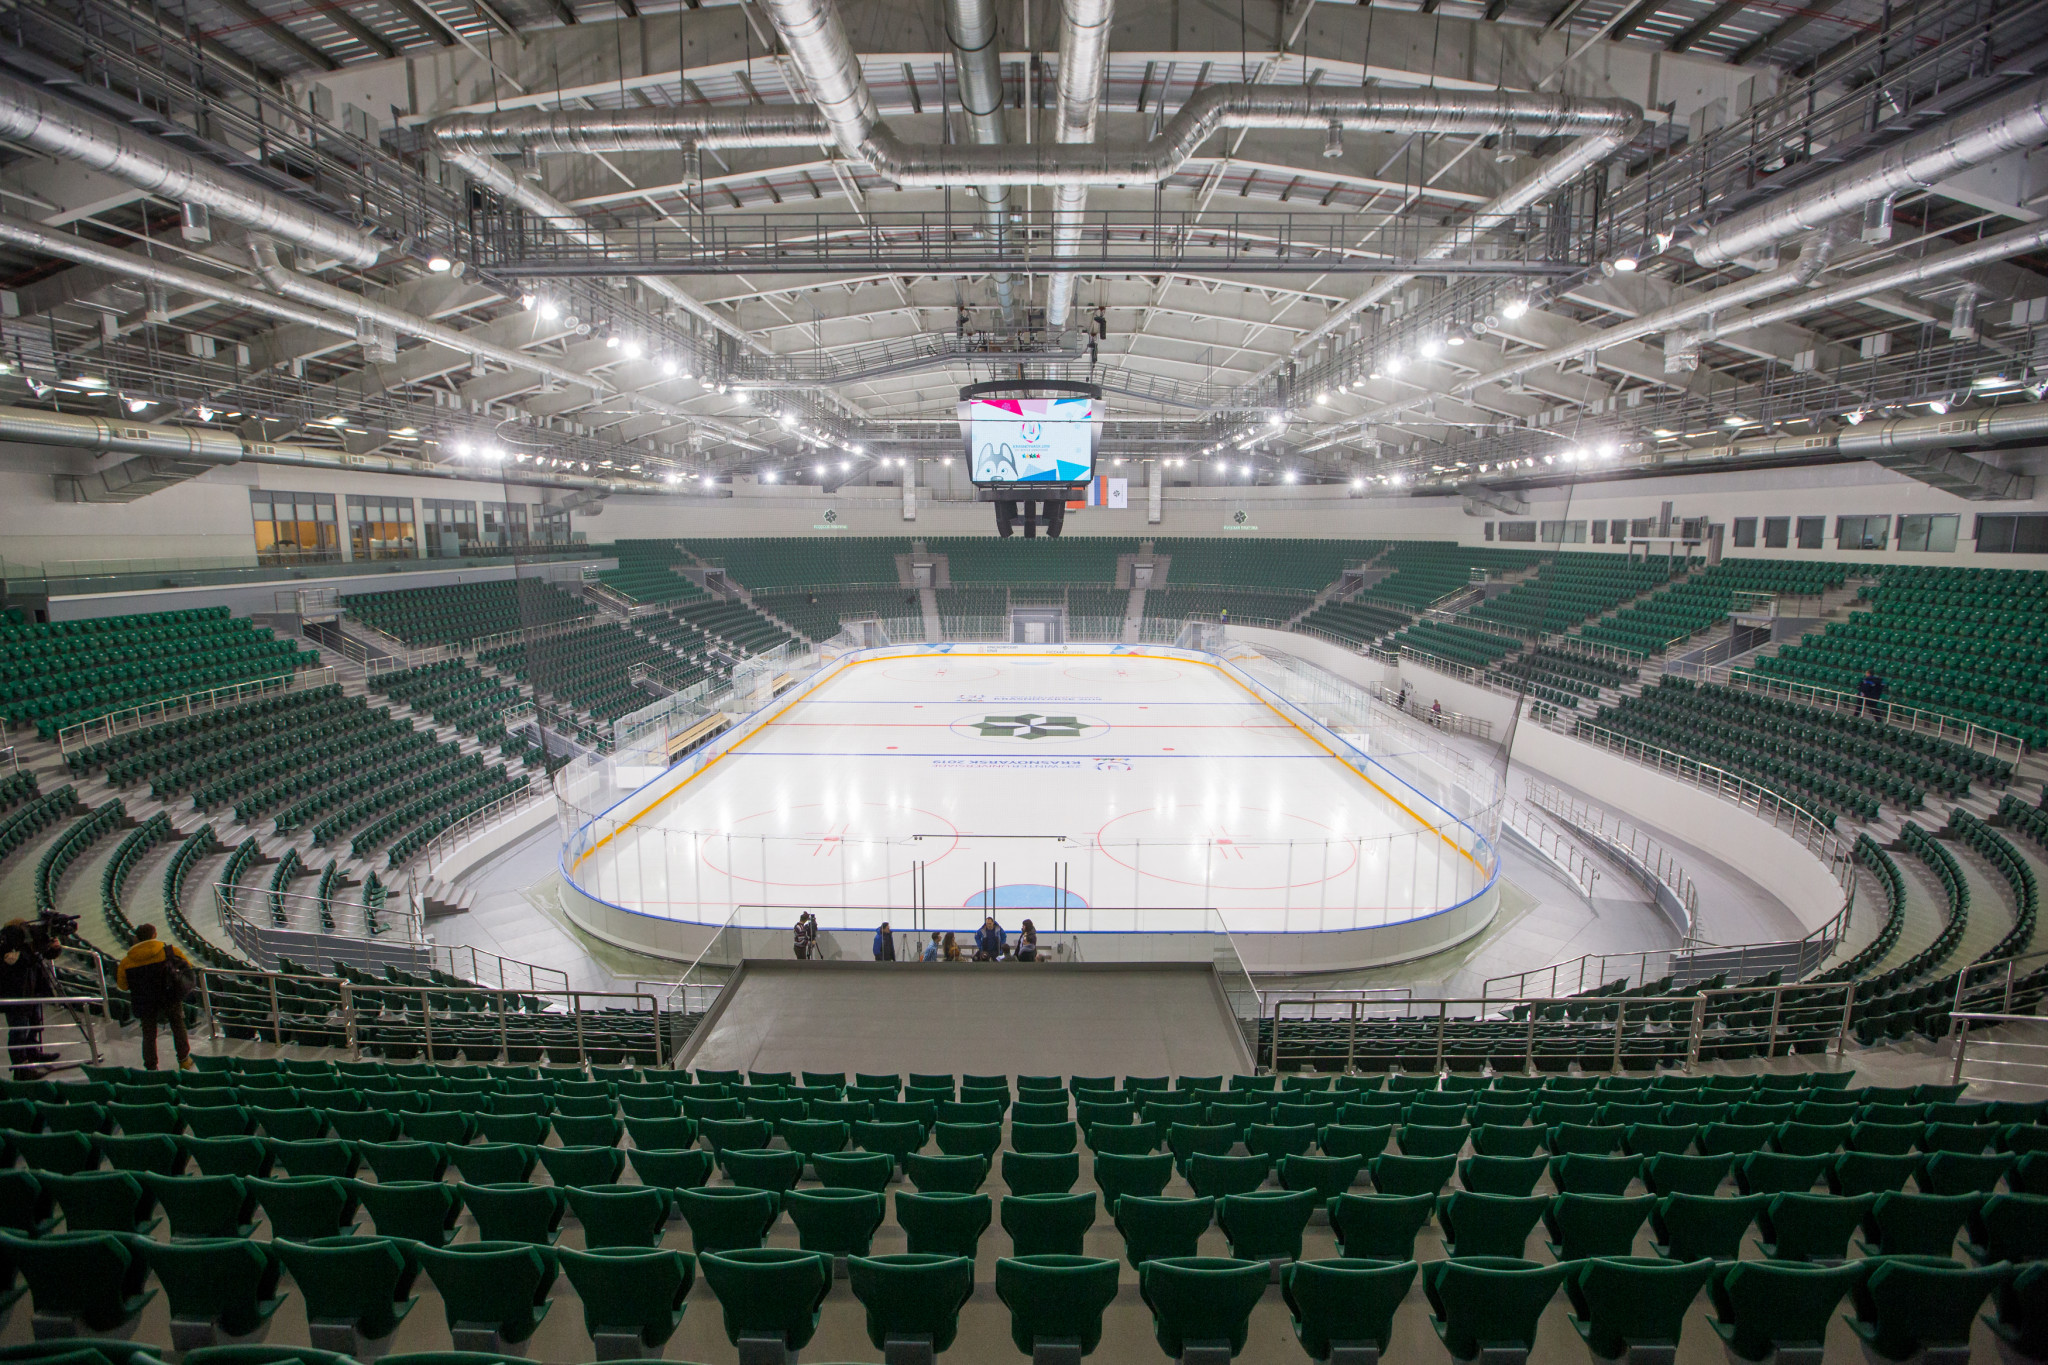 The Krasnoyarsk 2019 Winter Universiade figure skating competition will take place at the Platinum Arena ©Krasnoyarsk 2019